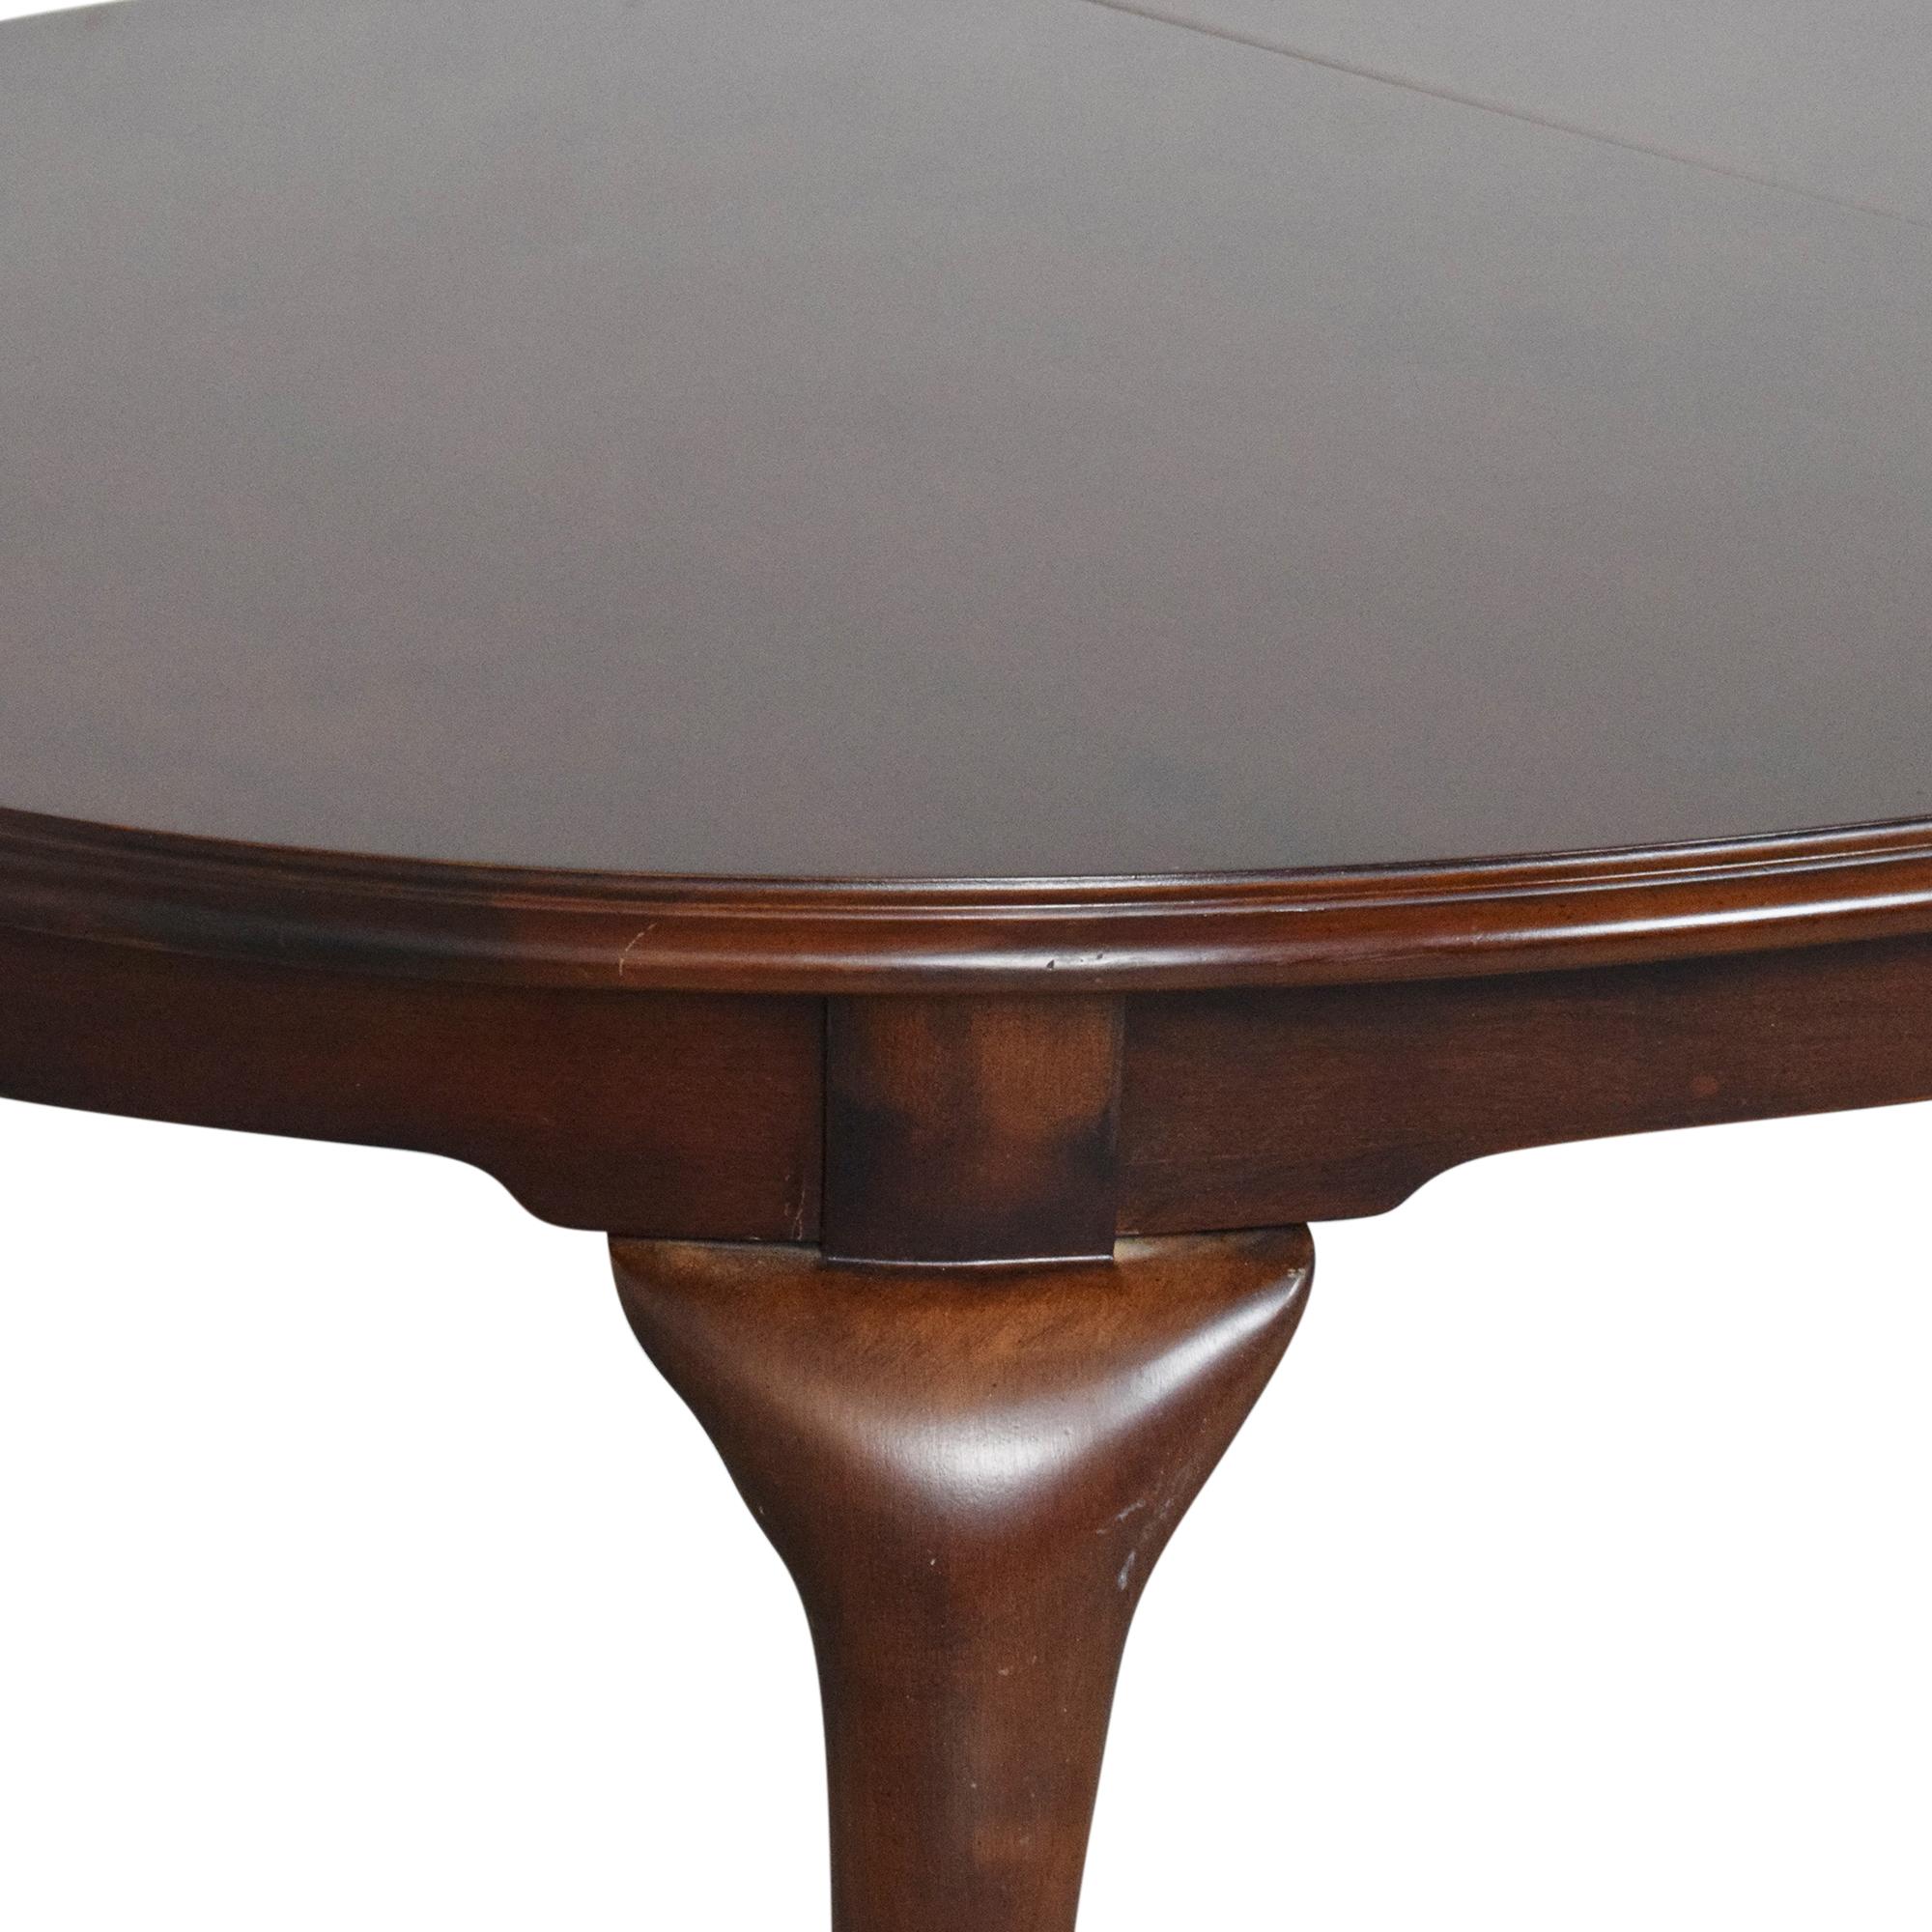 Bernhardt Bernhardt Queen Anne Oval Extendable Dining Table ma